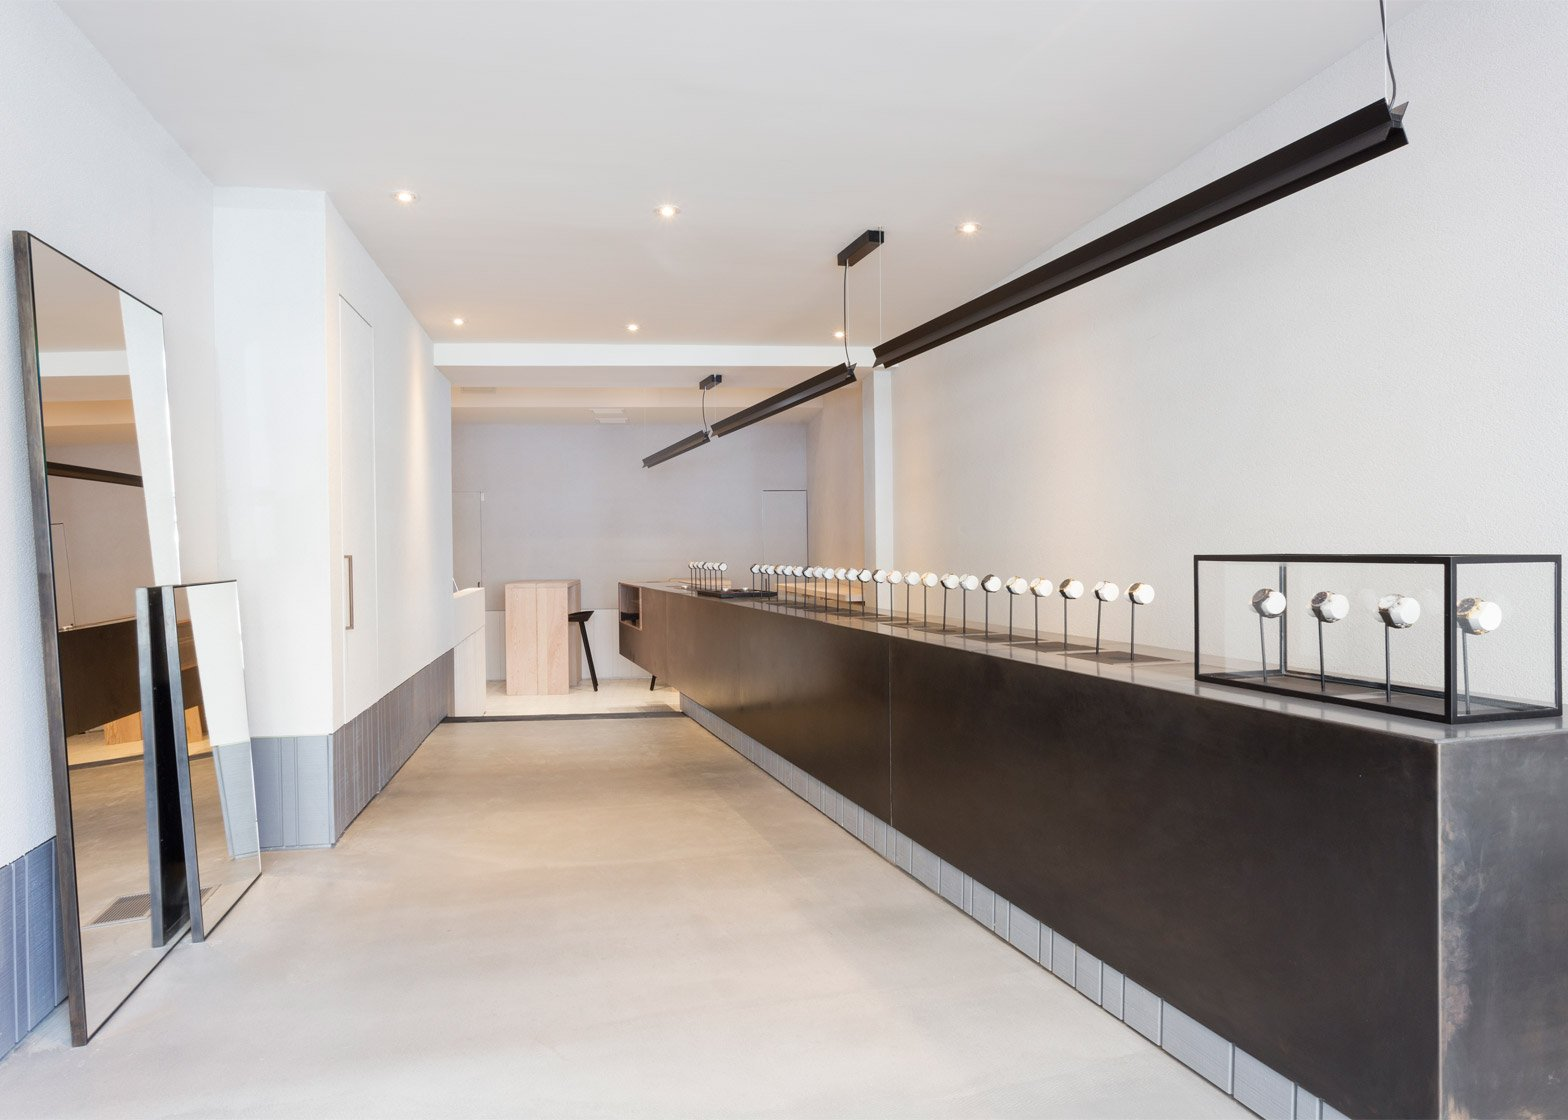 Larsson and Jennings' New York showroom